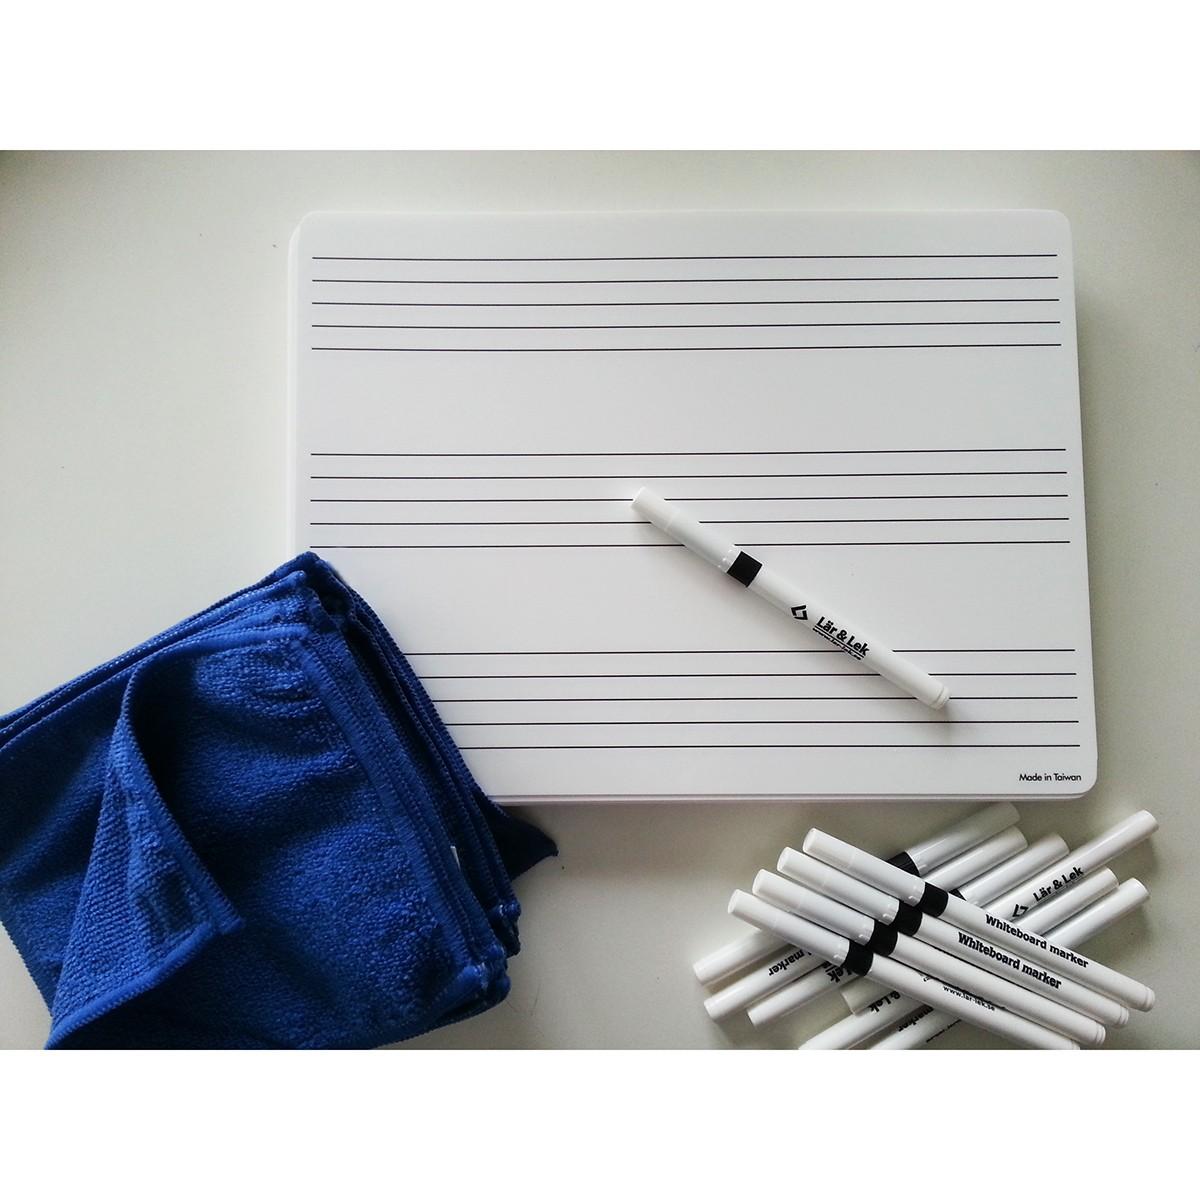 Not-tavla A4 + Whiteboardpennor & Mikrofiberdukar 30-pack